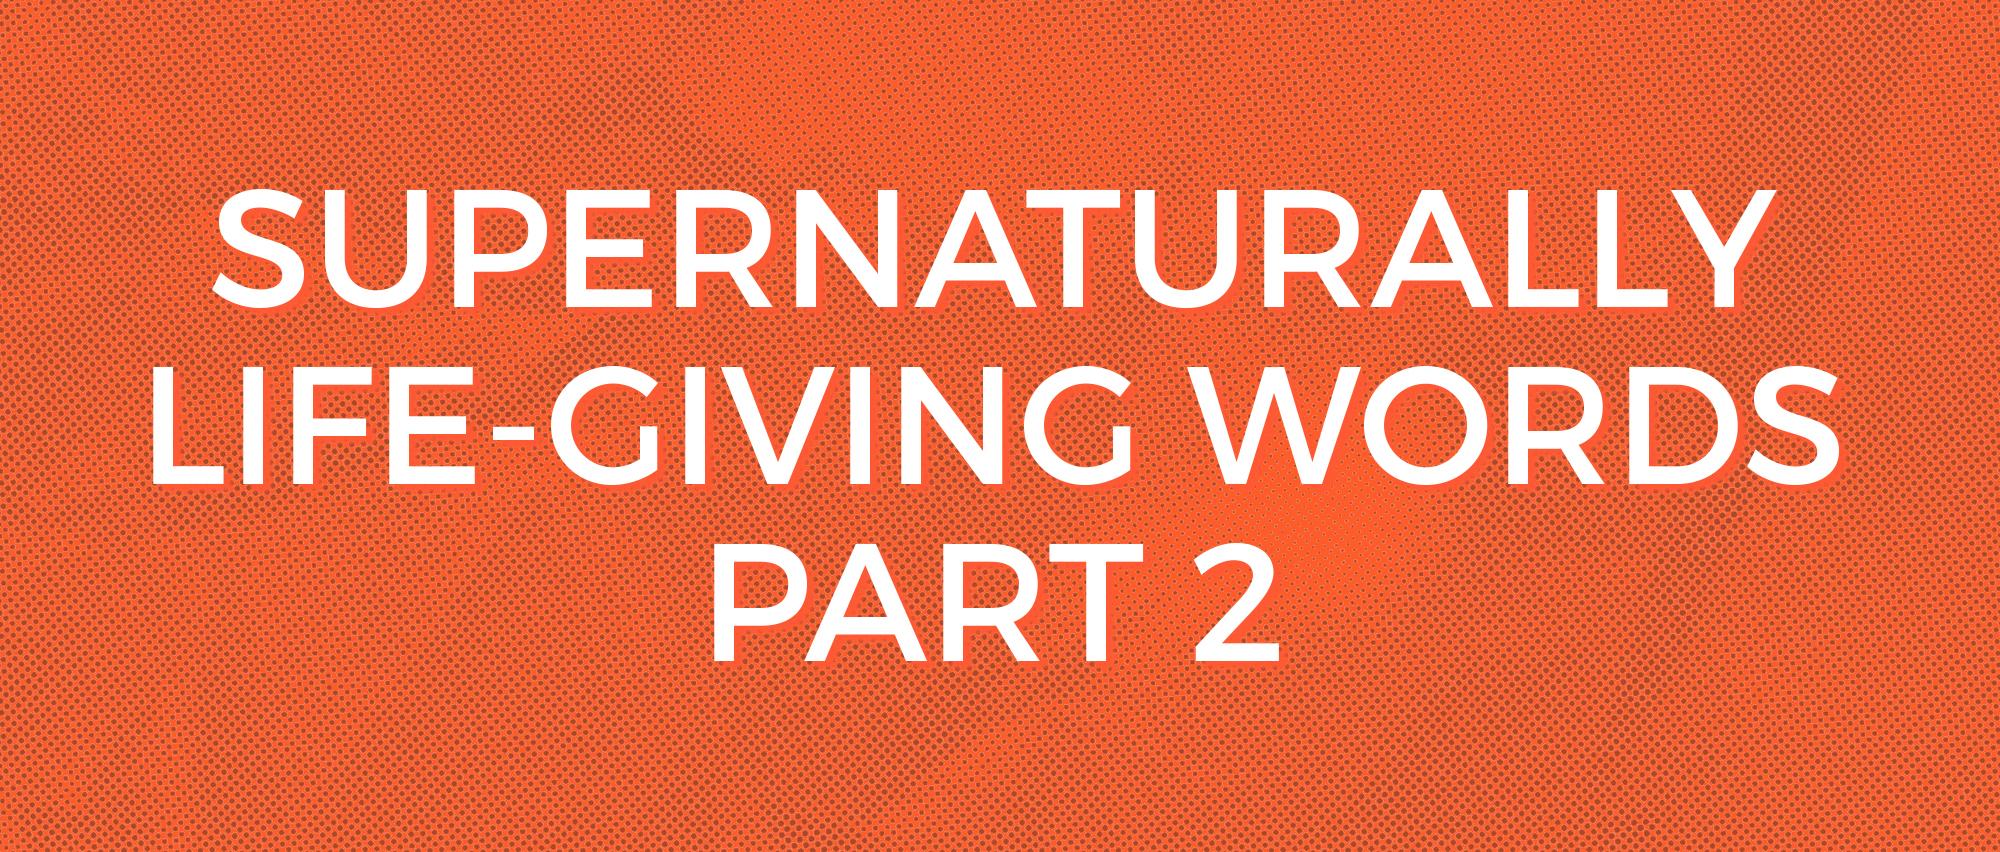 Supernaturally Life Giving Words Part 2.jpg